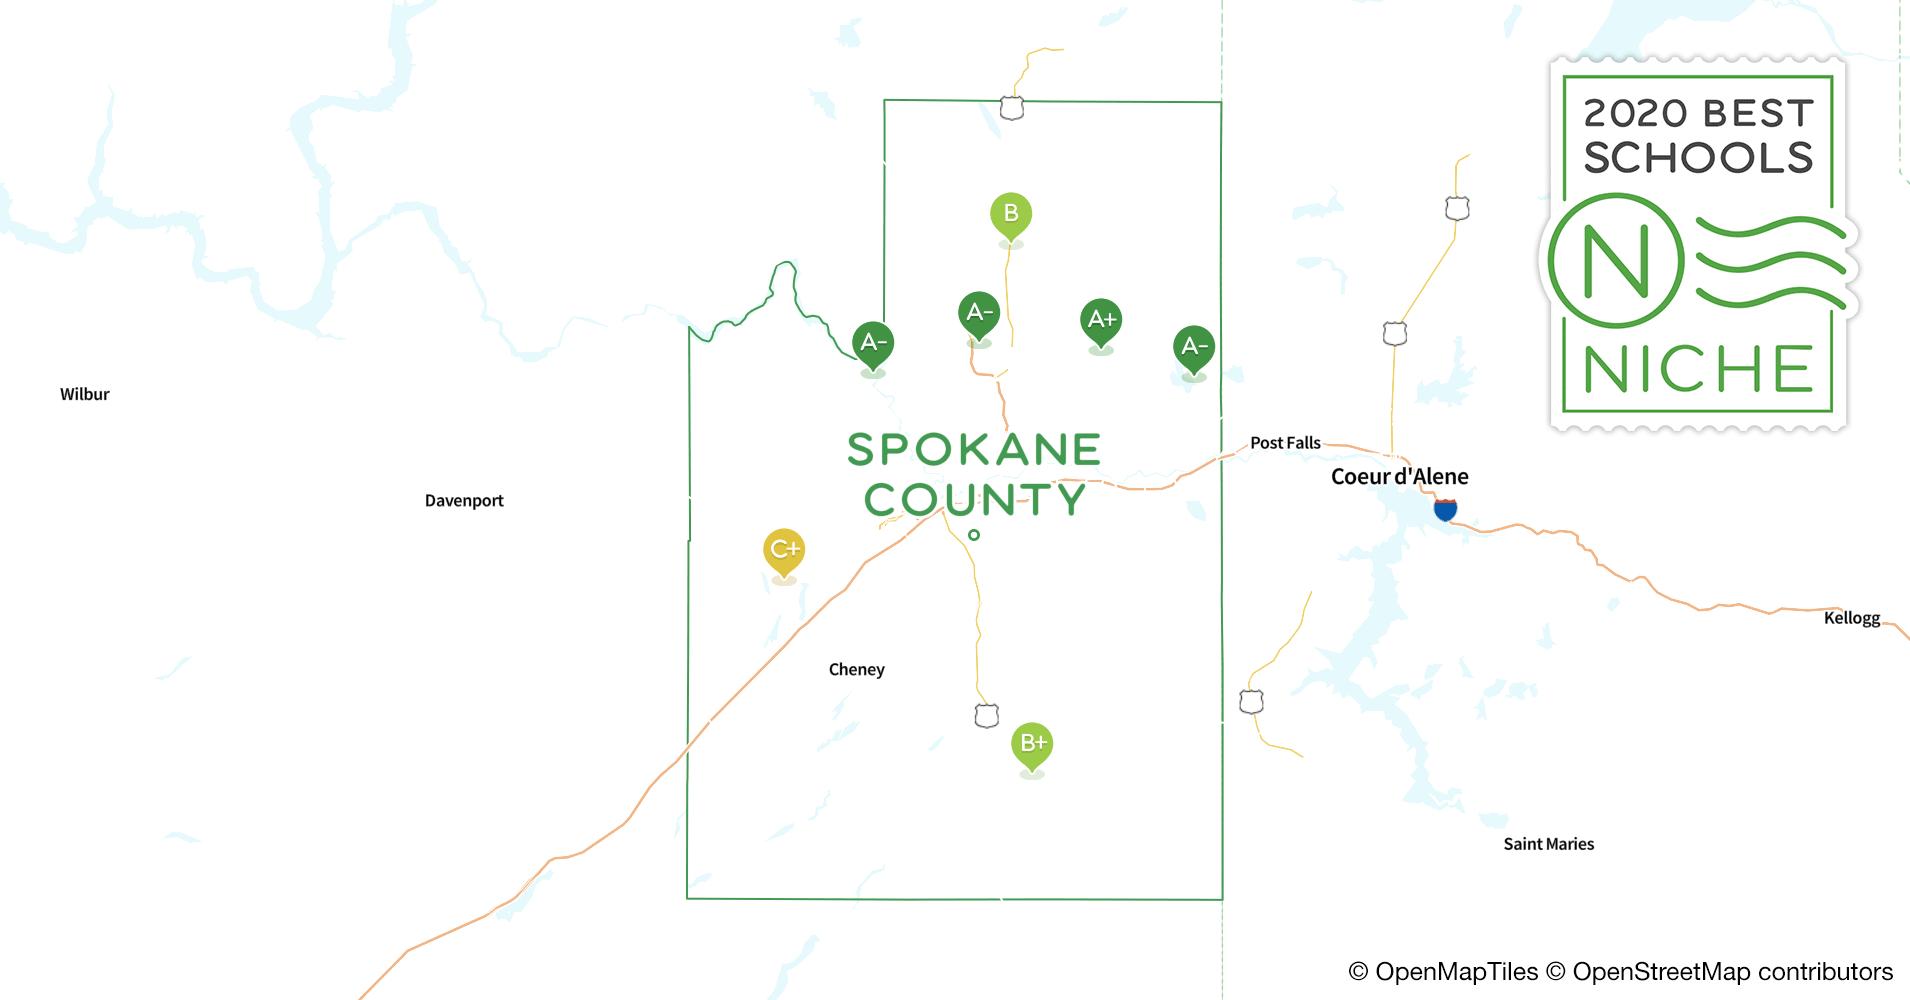 Catholic Schools In Spokane County Wa Niche